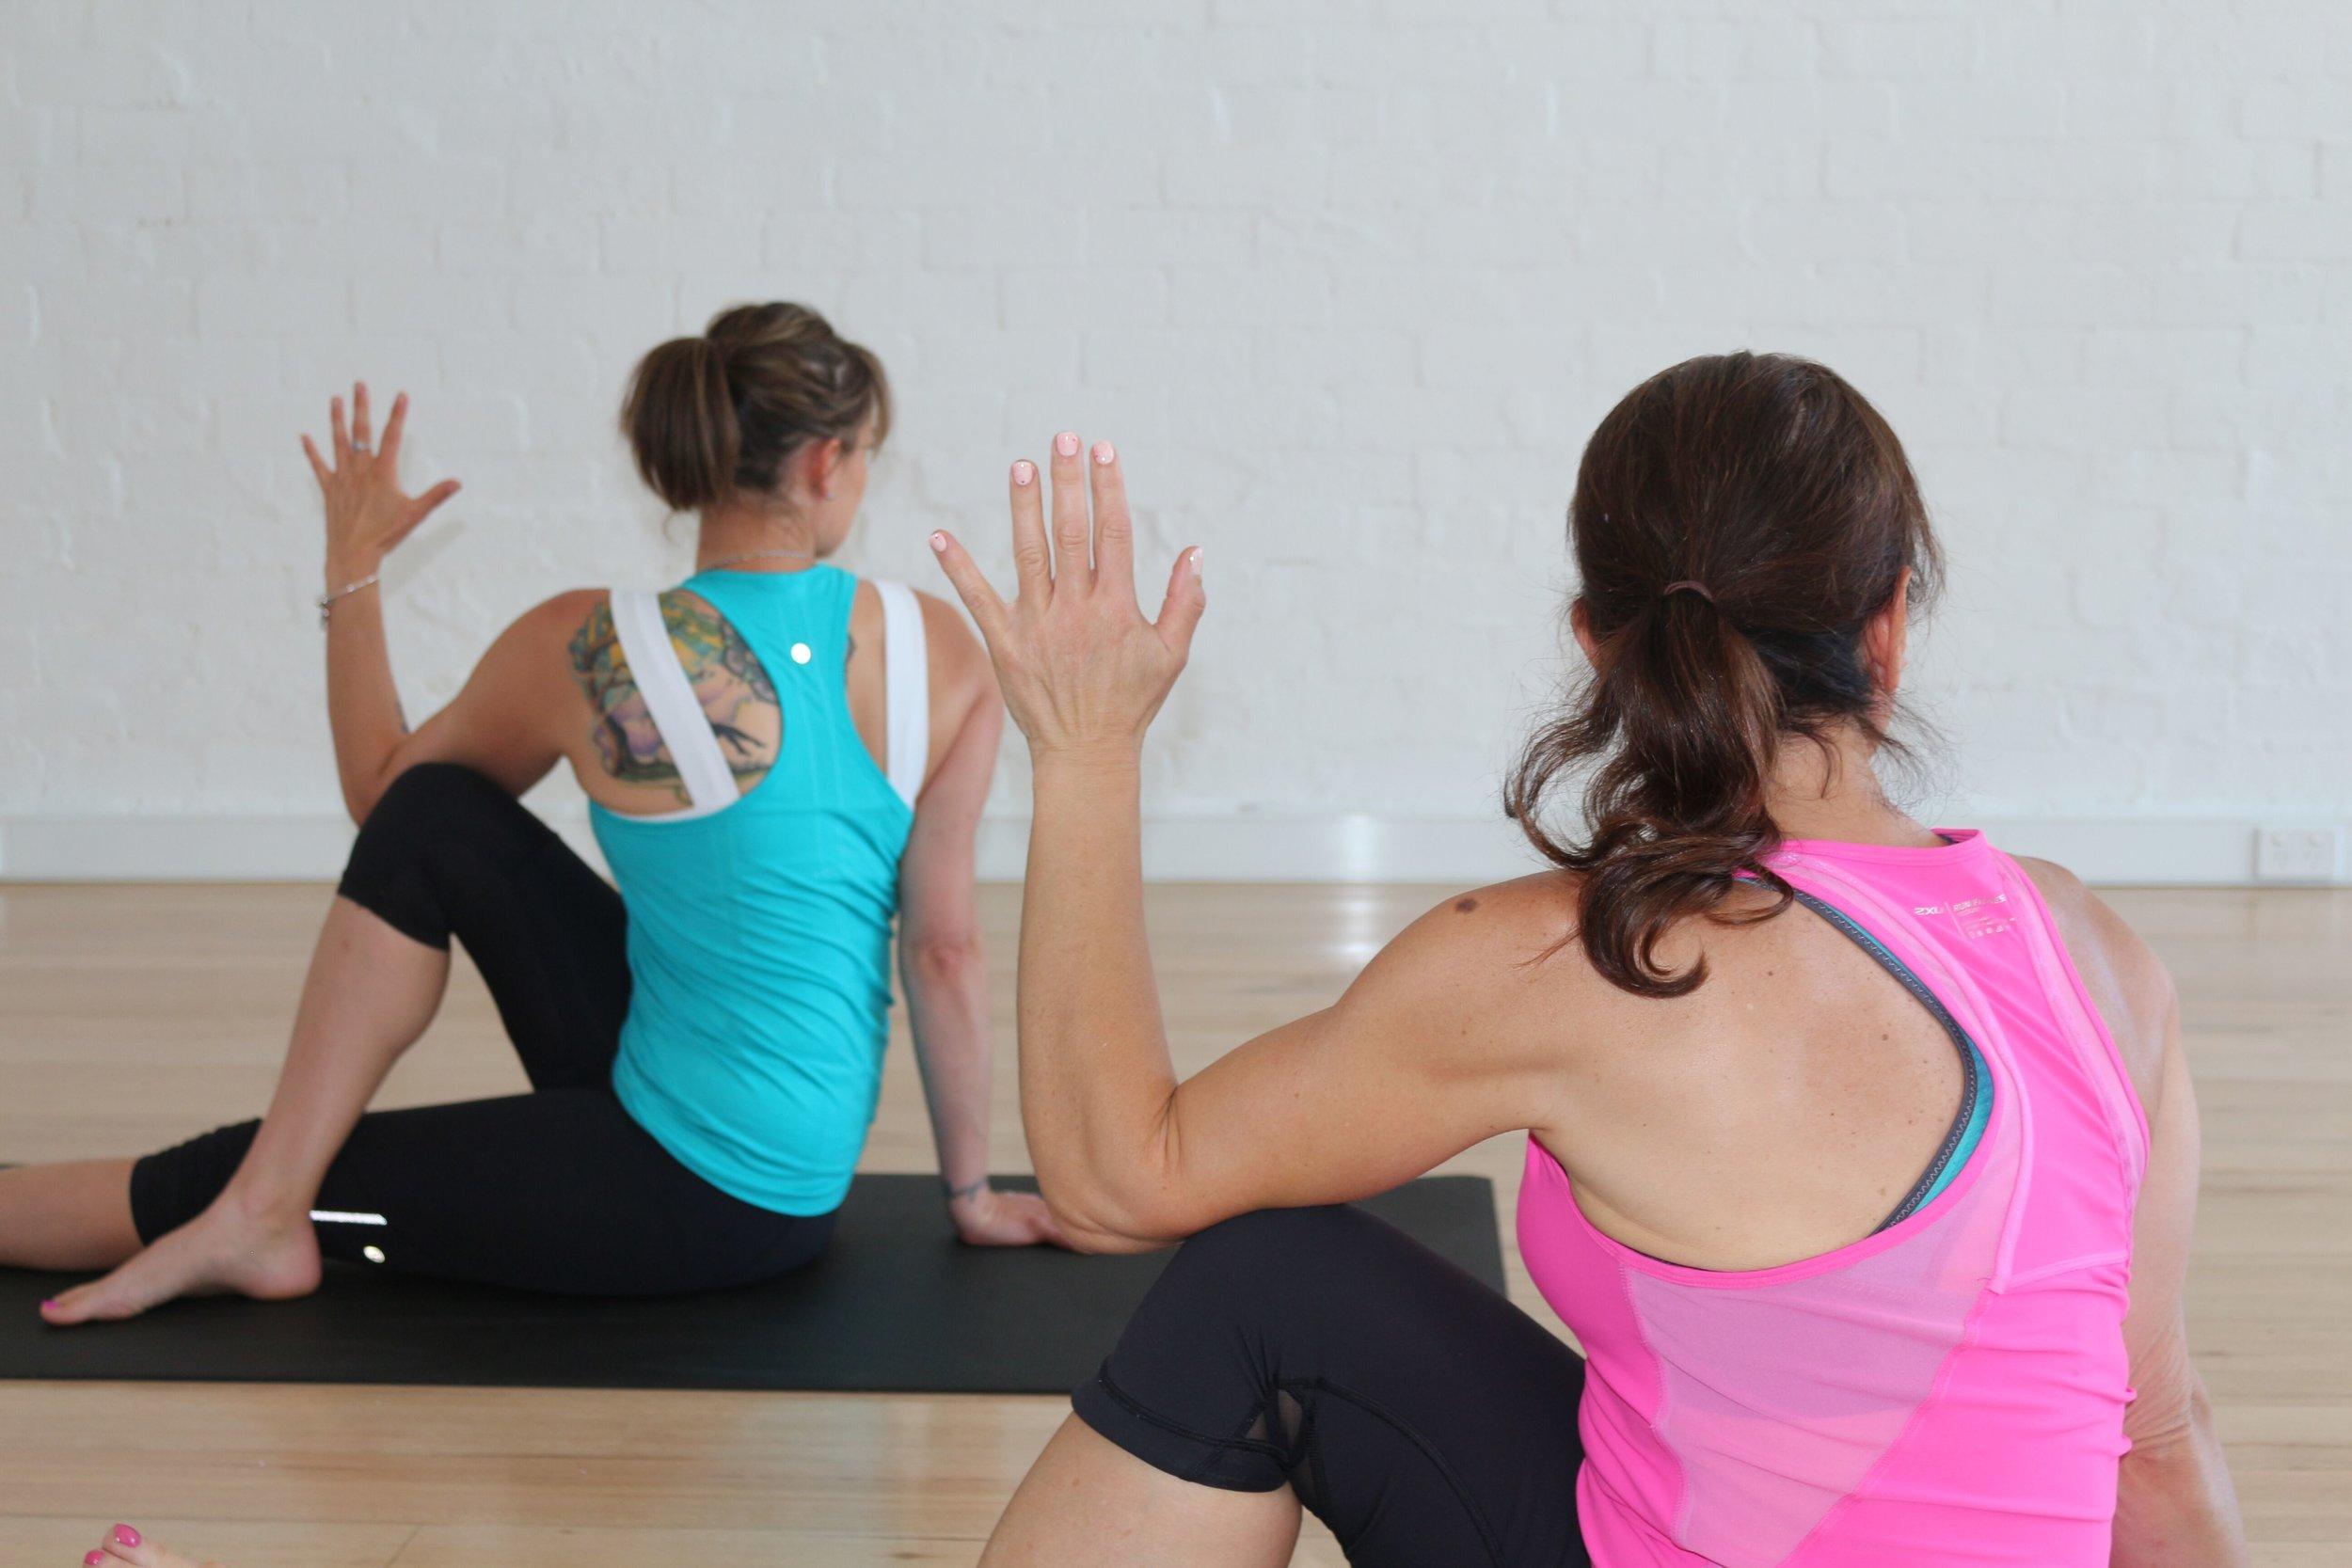 Gentle exercise &Yoga for seniors - WHEN: WEDNESDAYDURATION: 1 HOUR